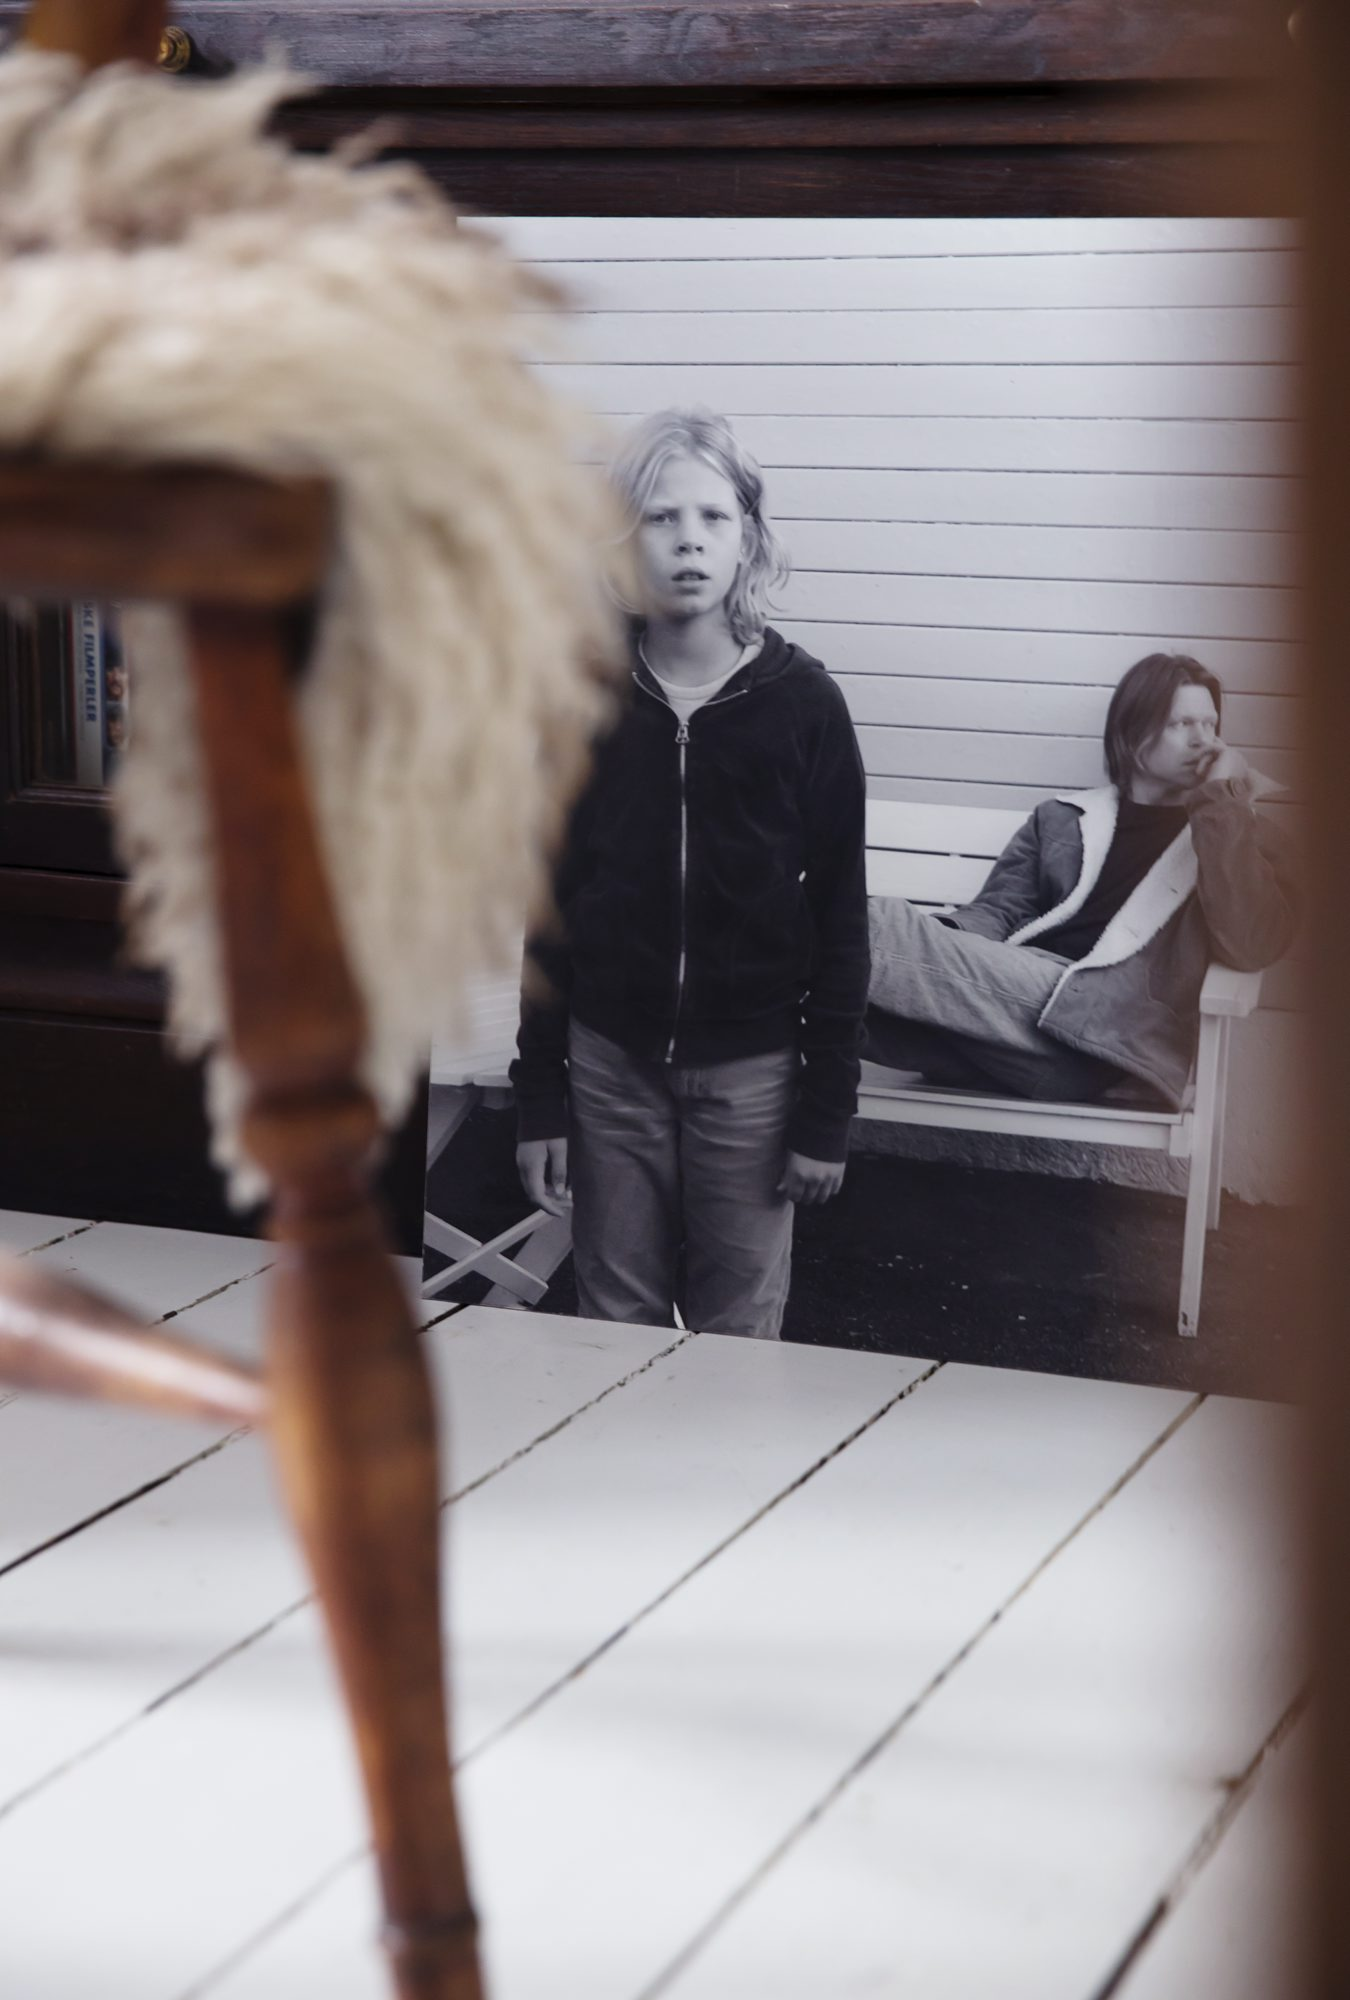 Vigdis og Bård sveitserhus i Trondheim Tekst: Åsne Hjukse Styling: Tone Kroken Foto: Yvonne Wilhelmsen